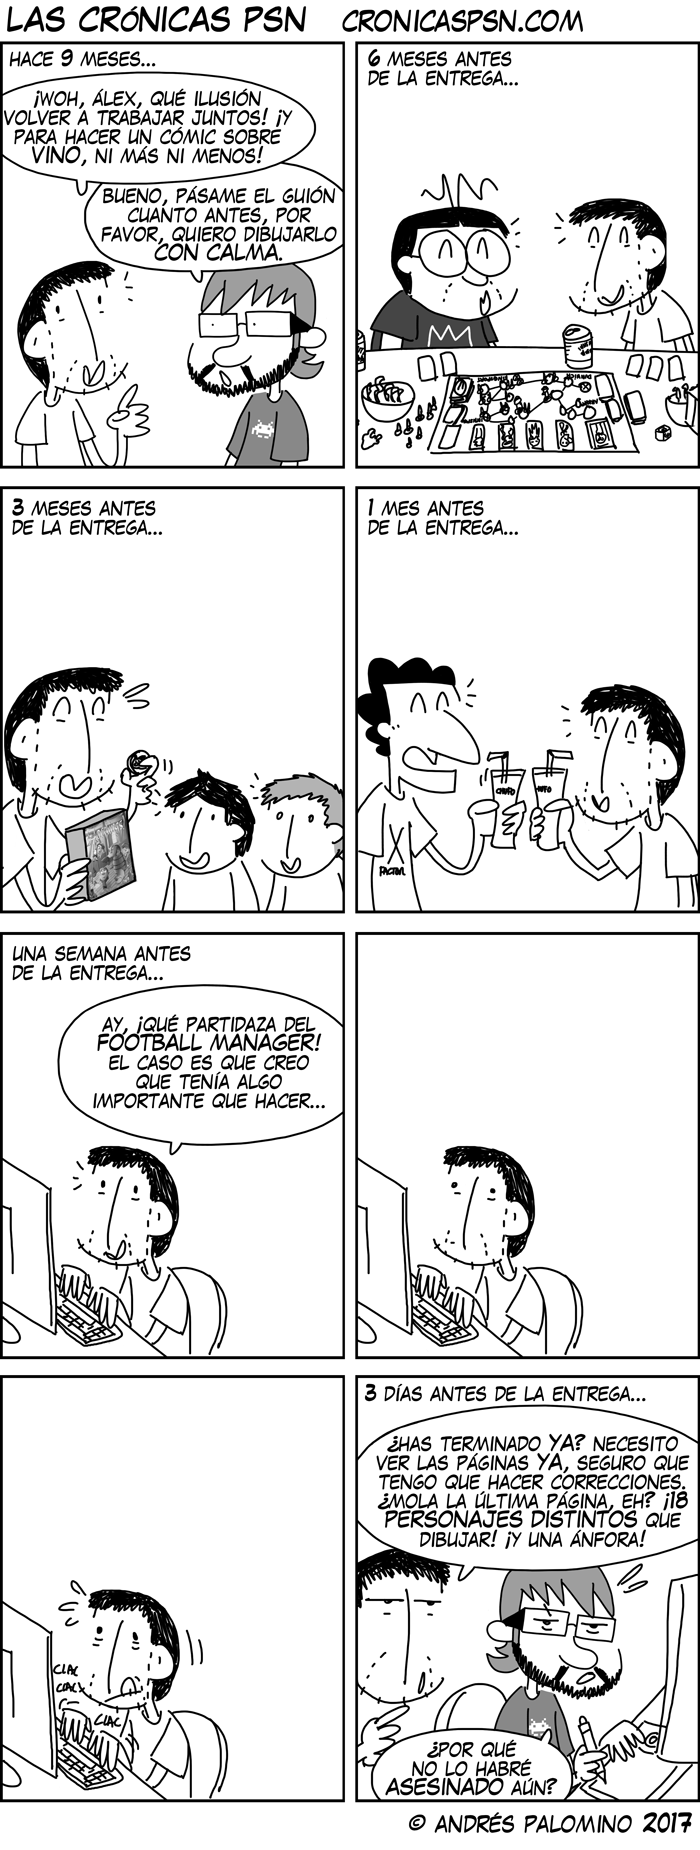 CPSN: TÁNDEM